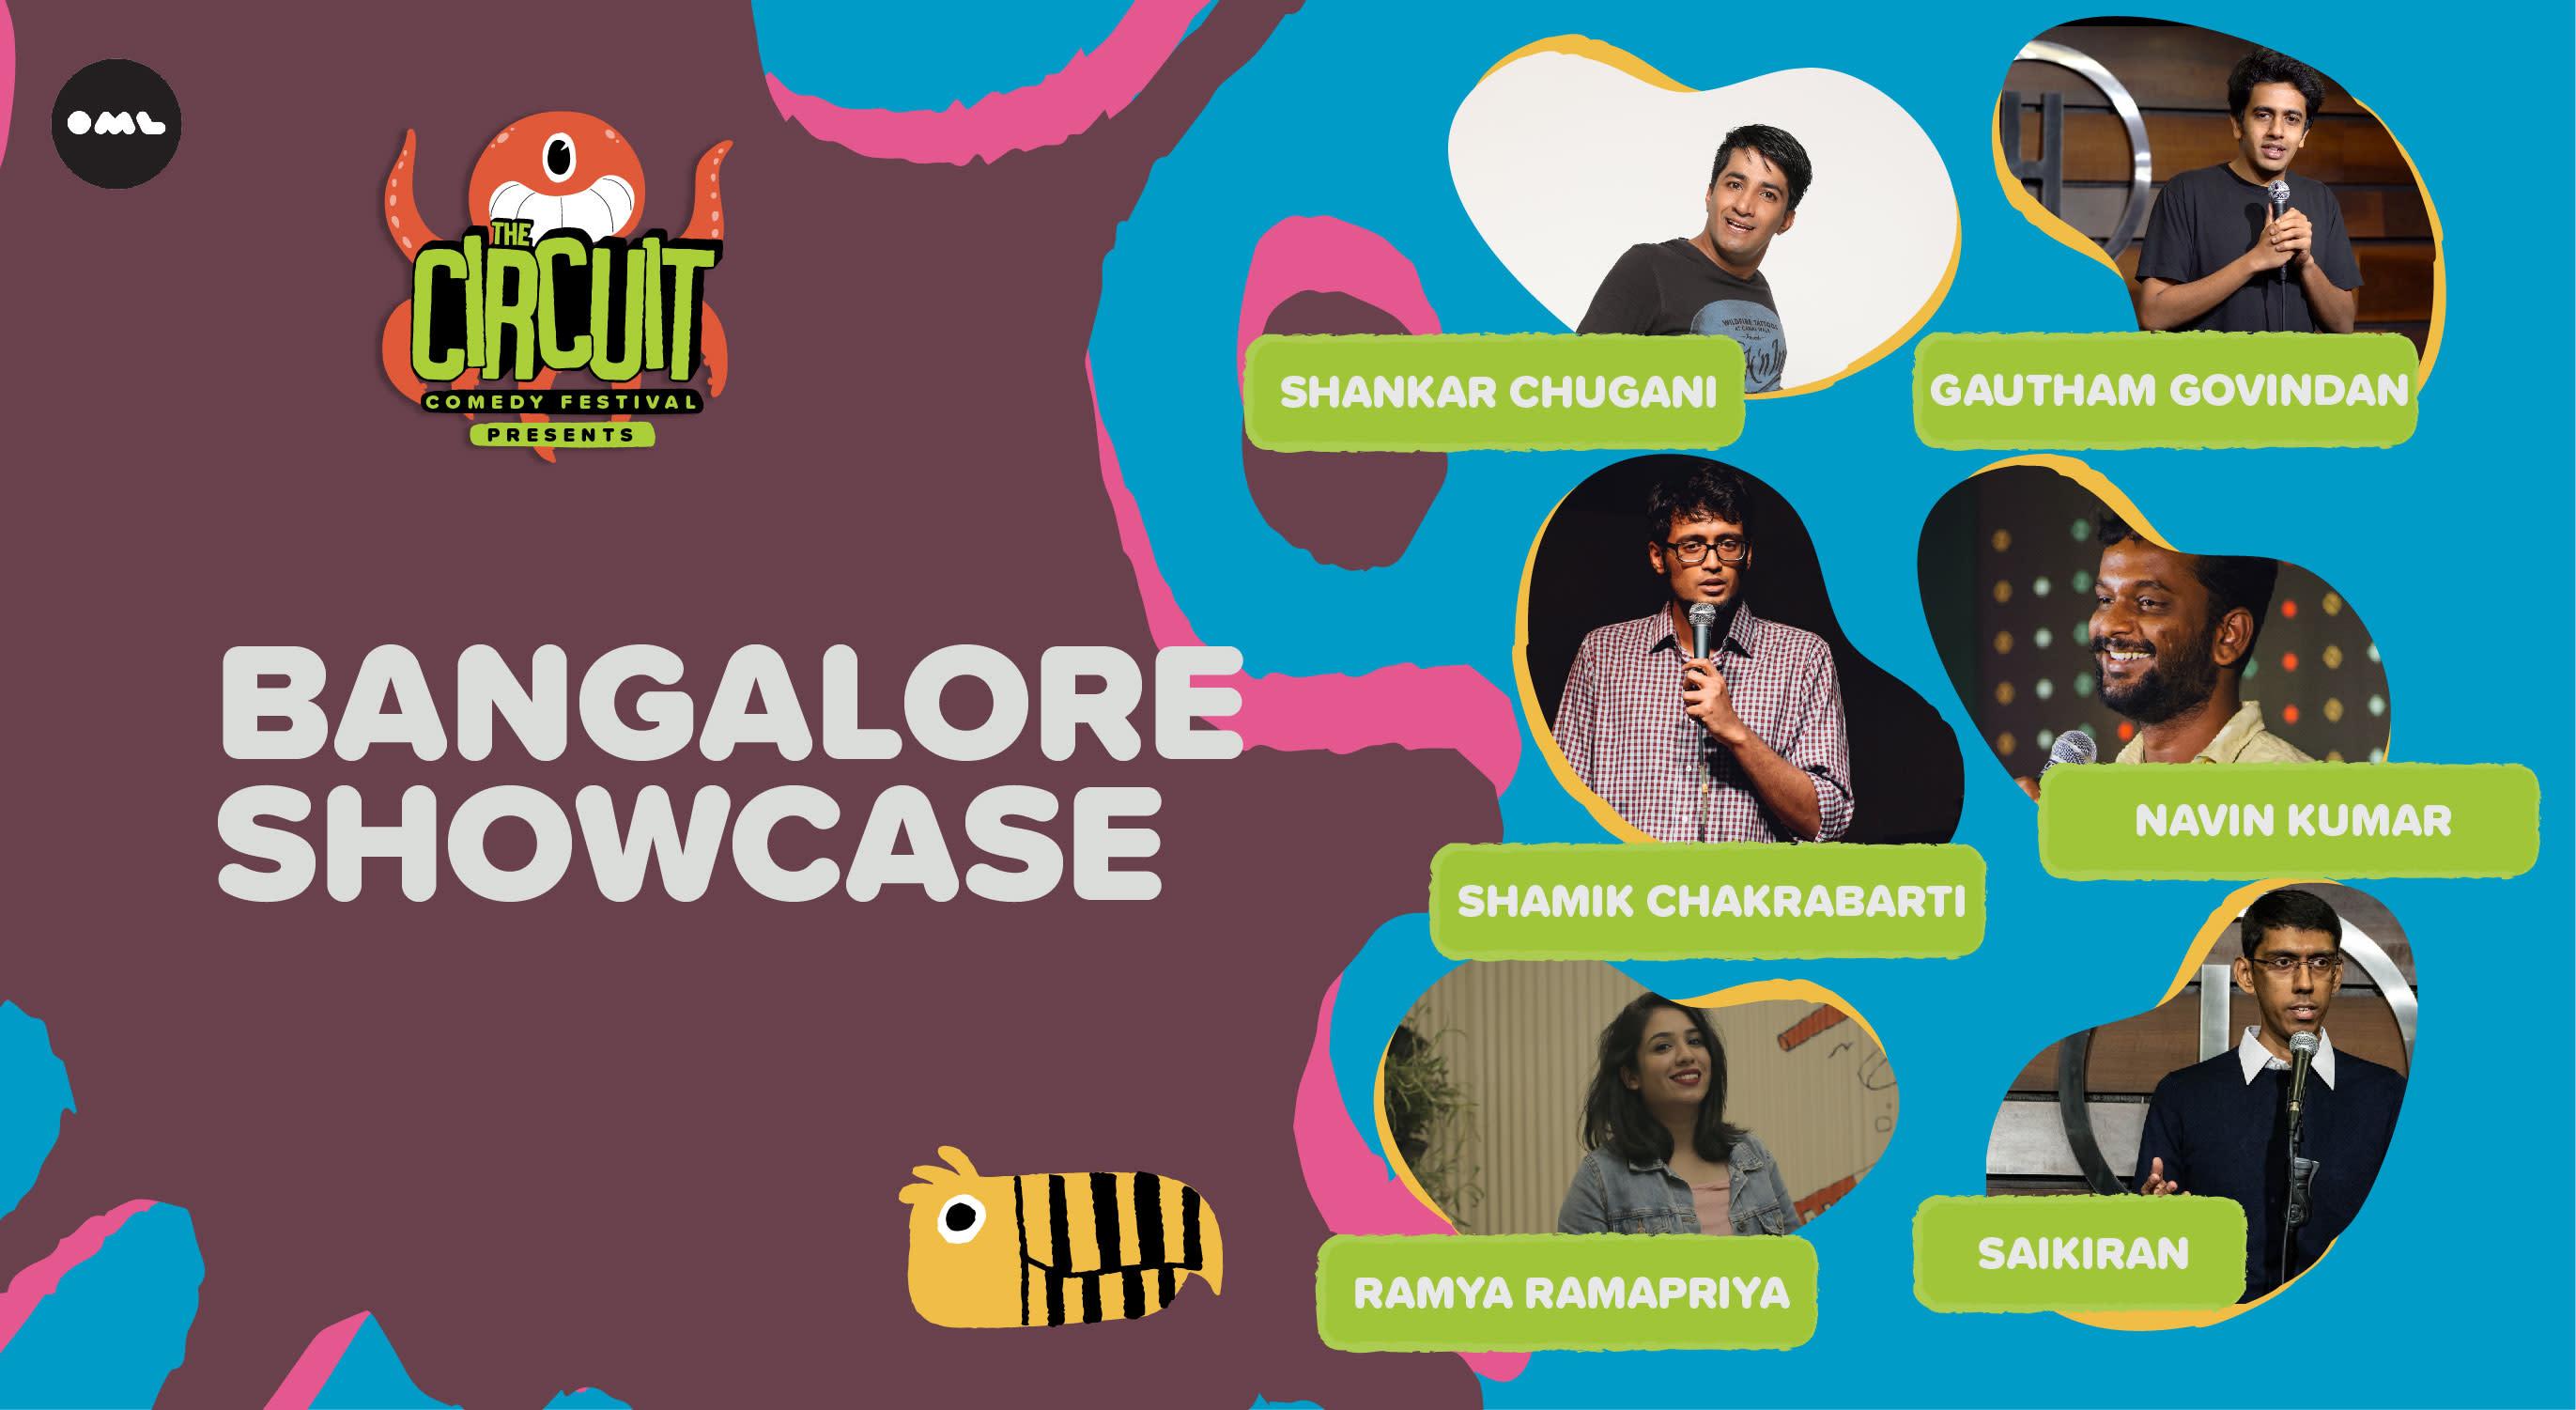 Bengaluru Showcase | The Circuit Comedy Festival, Bengaluru